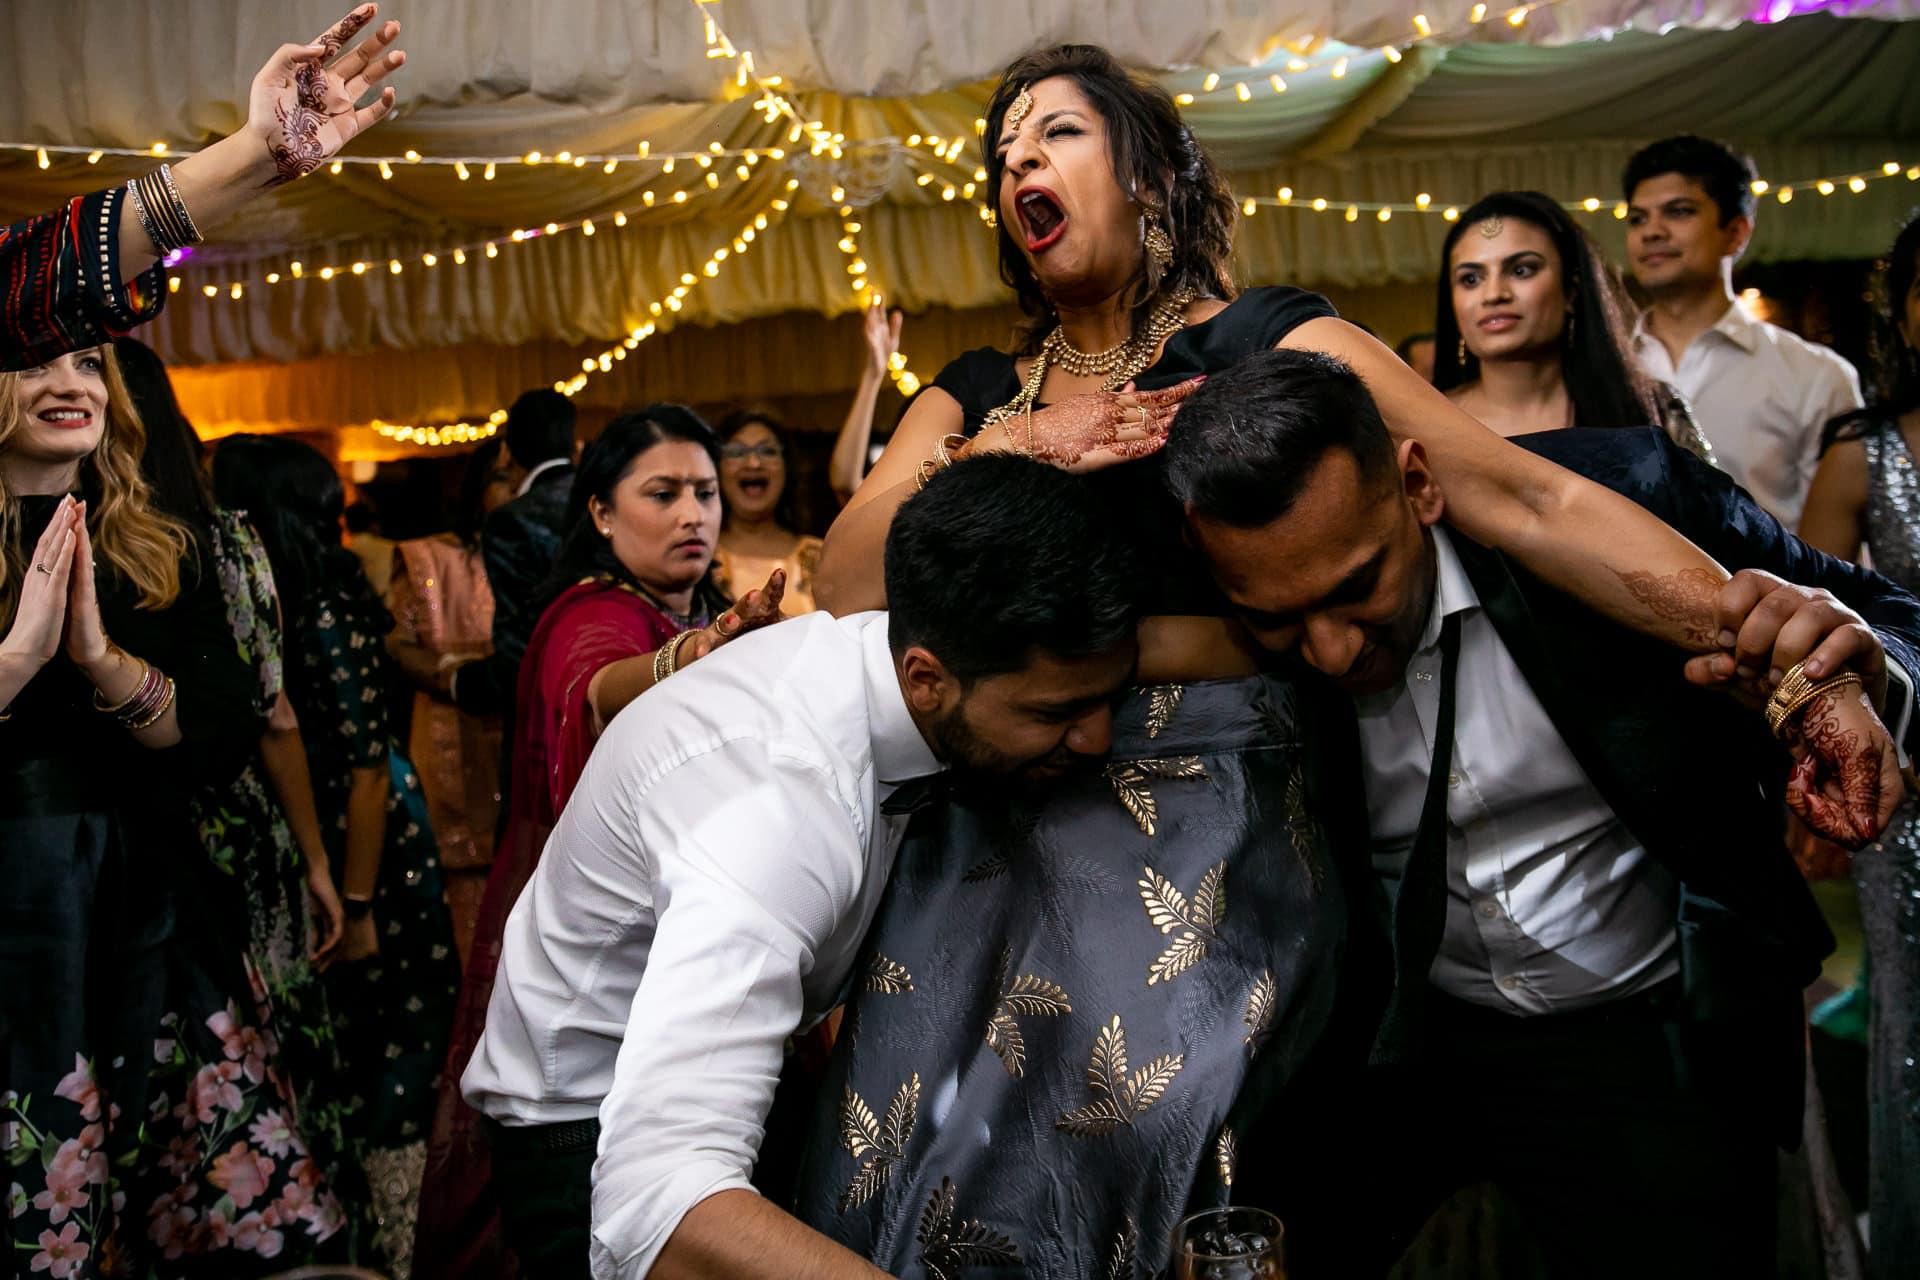 Hindu wedding reception party at Northbook Park